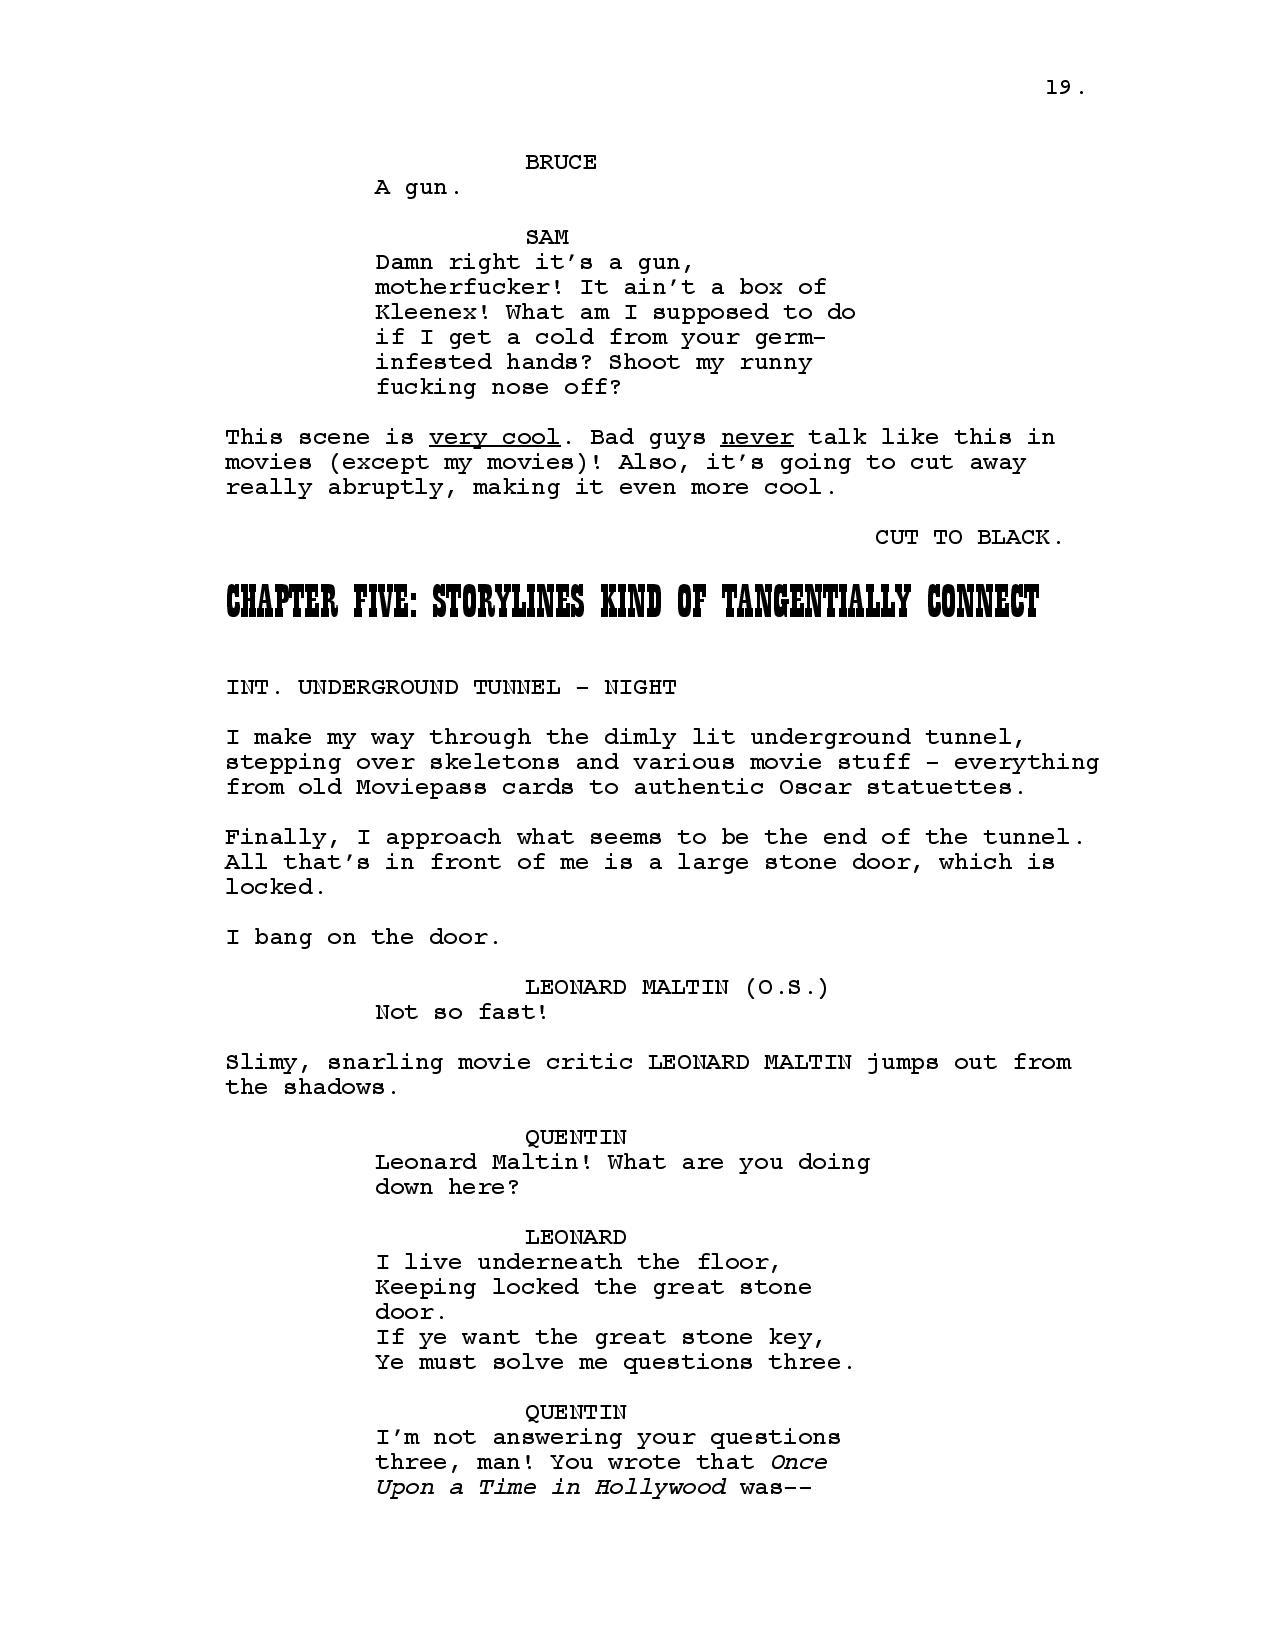 New Tarantino Screenplay-1-page-020